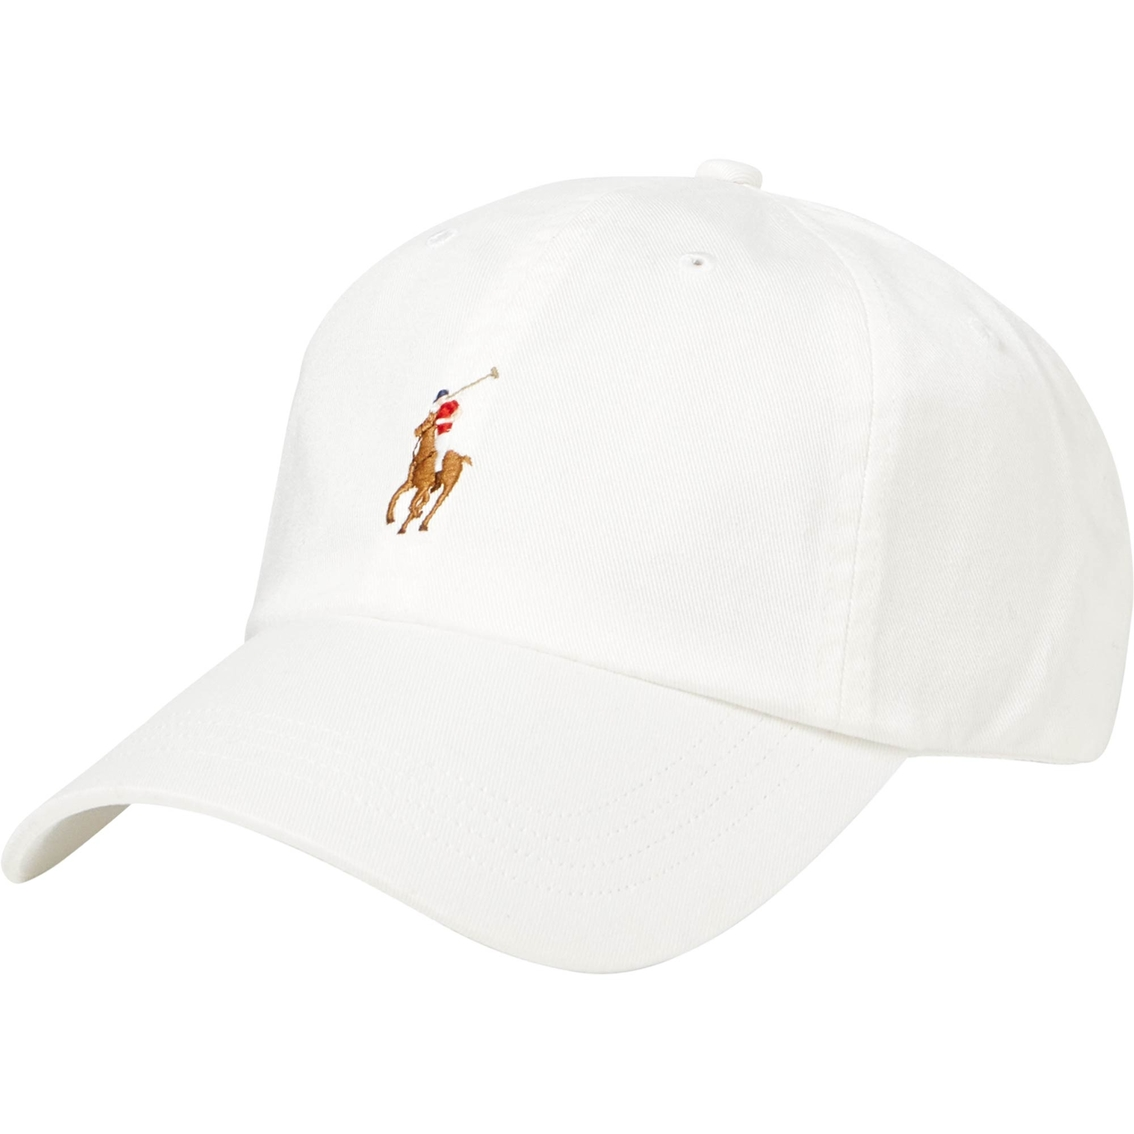 29ed674986 Polo Ralph Lauren Cotton Chino Baseball Cap | Hats | Apparel | Shop ...